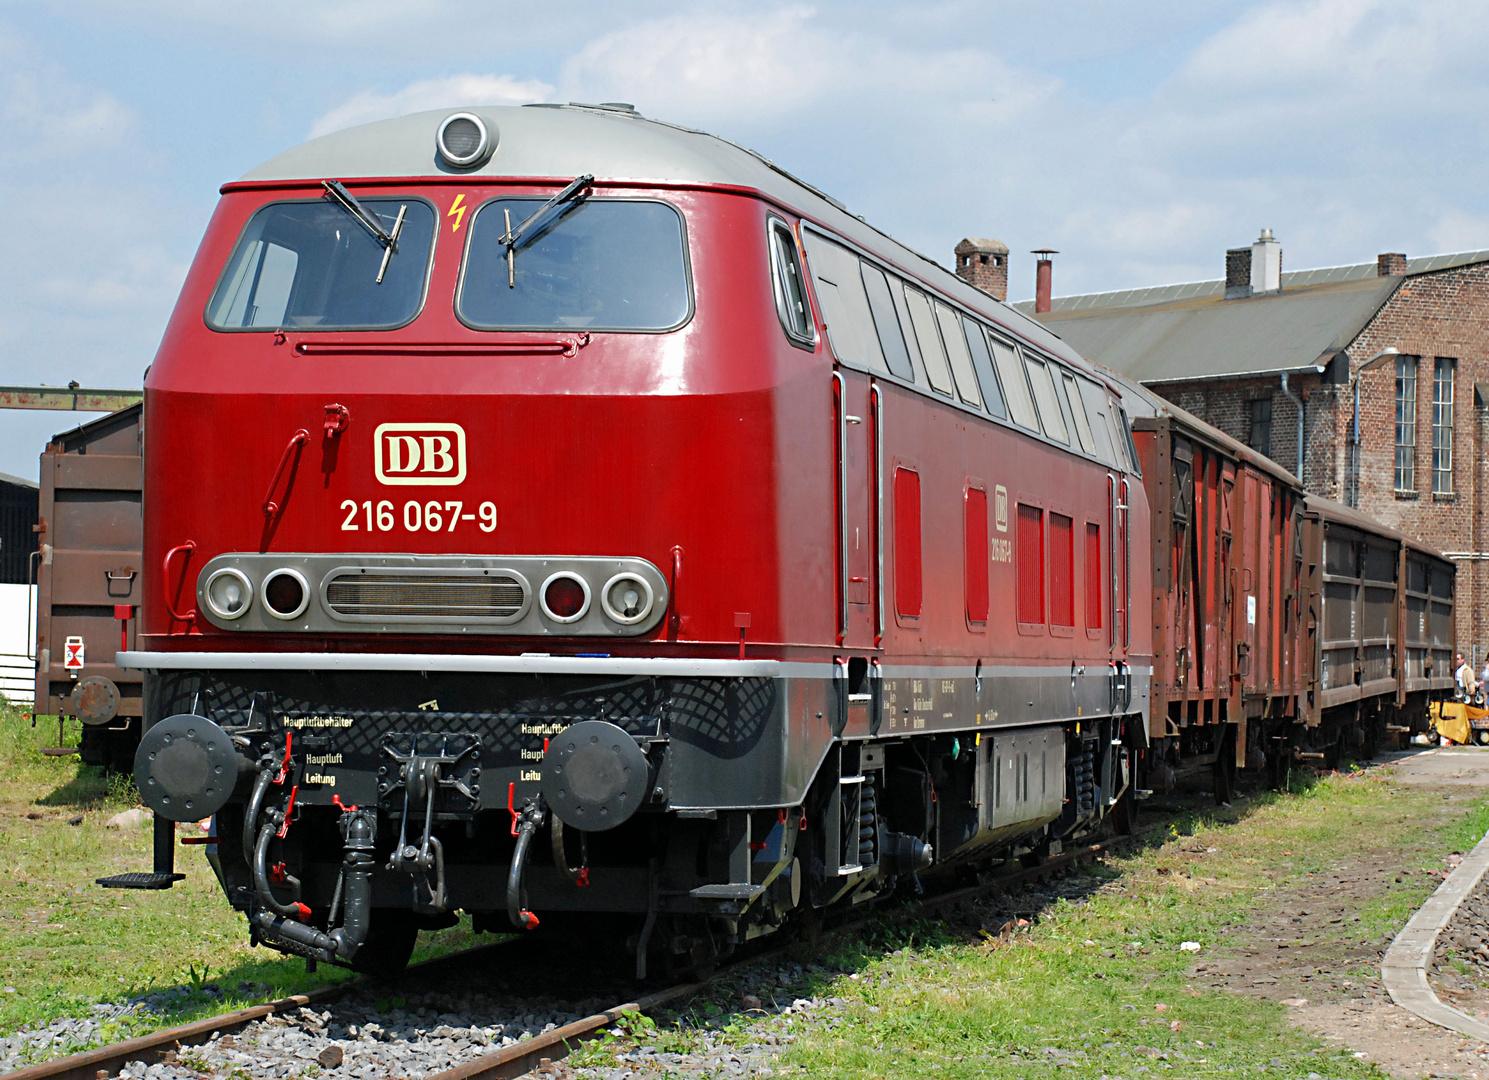 DB 216 067-9